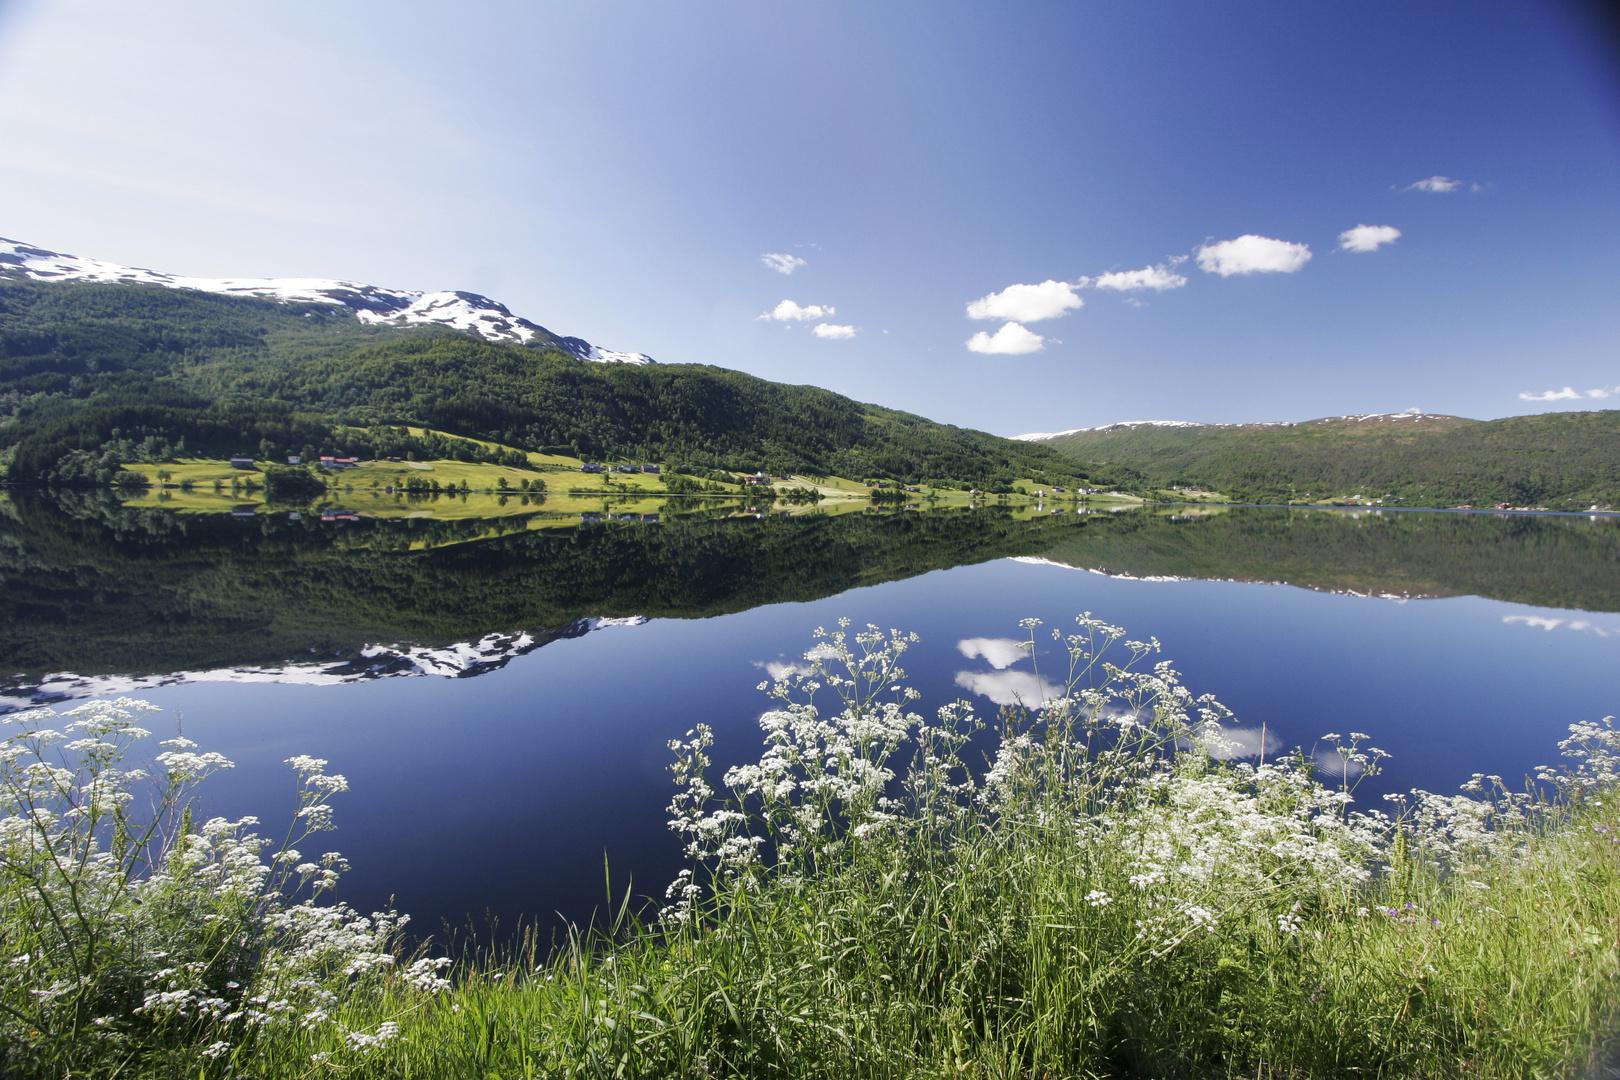 Norwegen - Land der unzähligen Seen